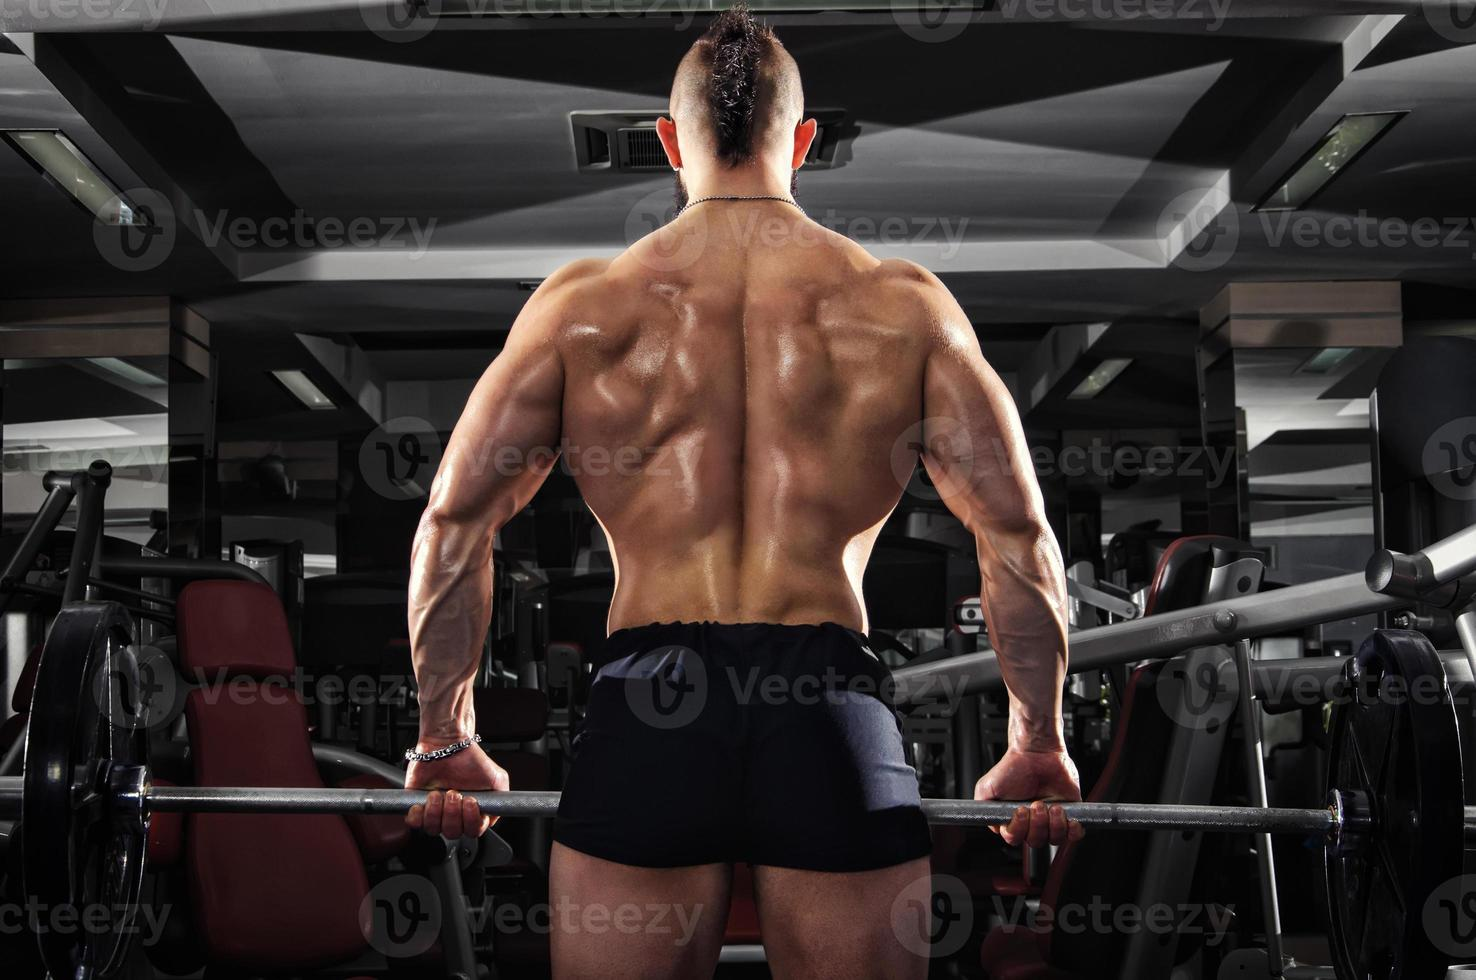 homem musculoso, levantando alguns halteres pesados foto